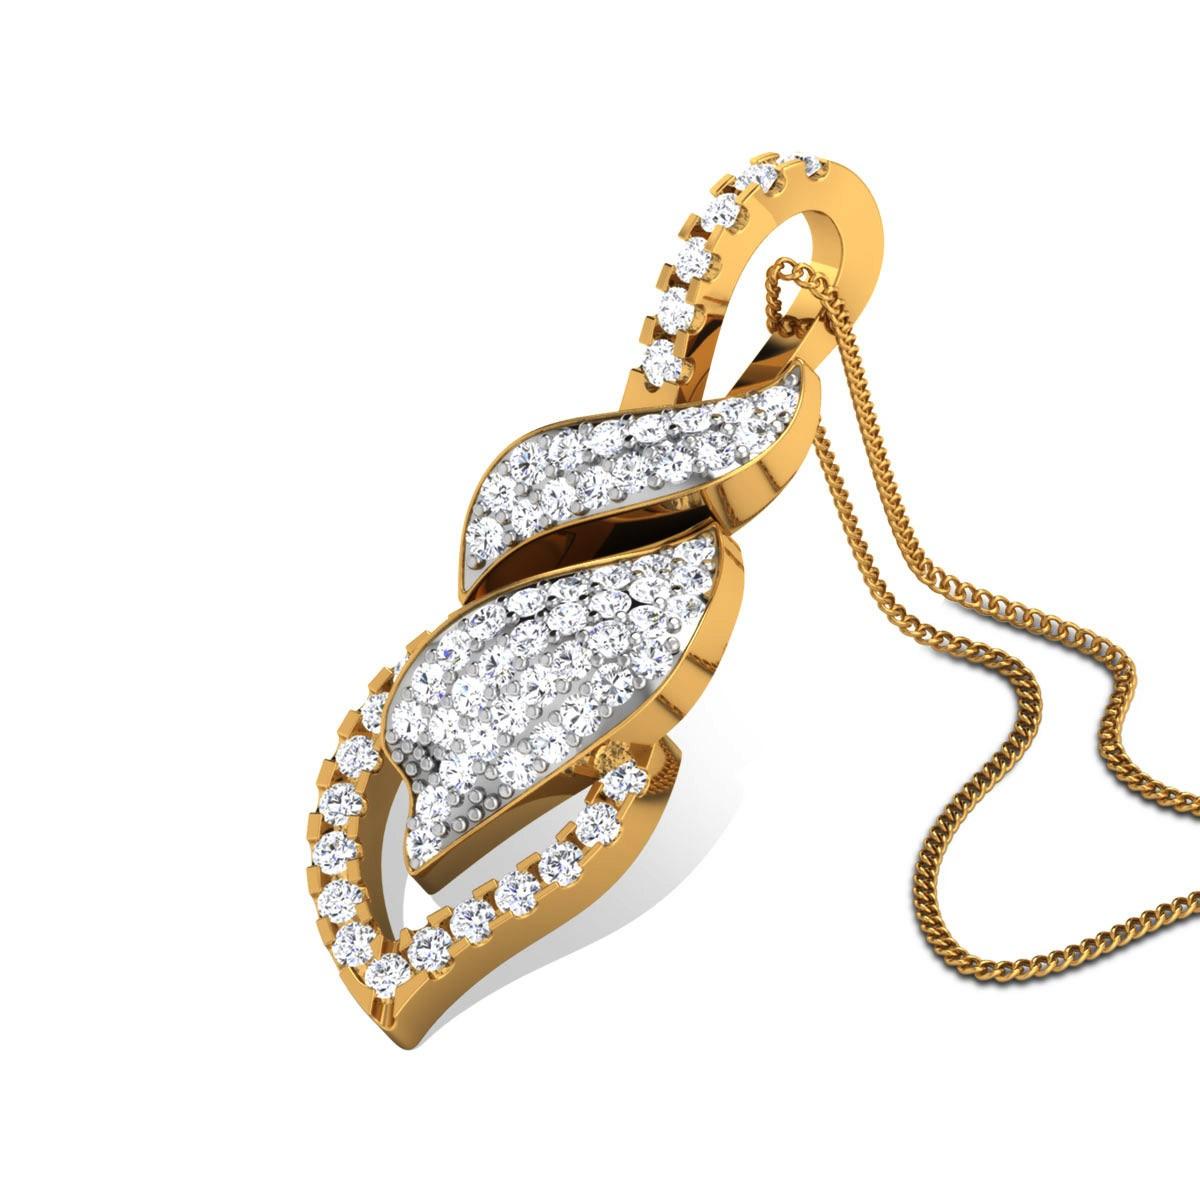 Bratati Diamond Pendant